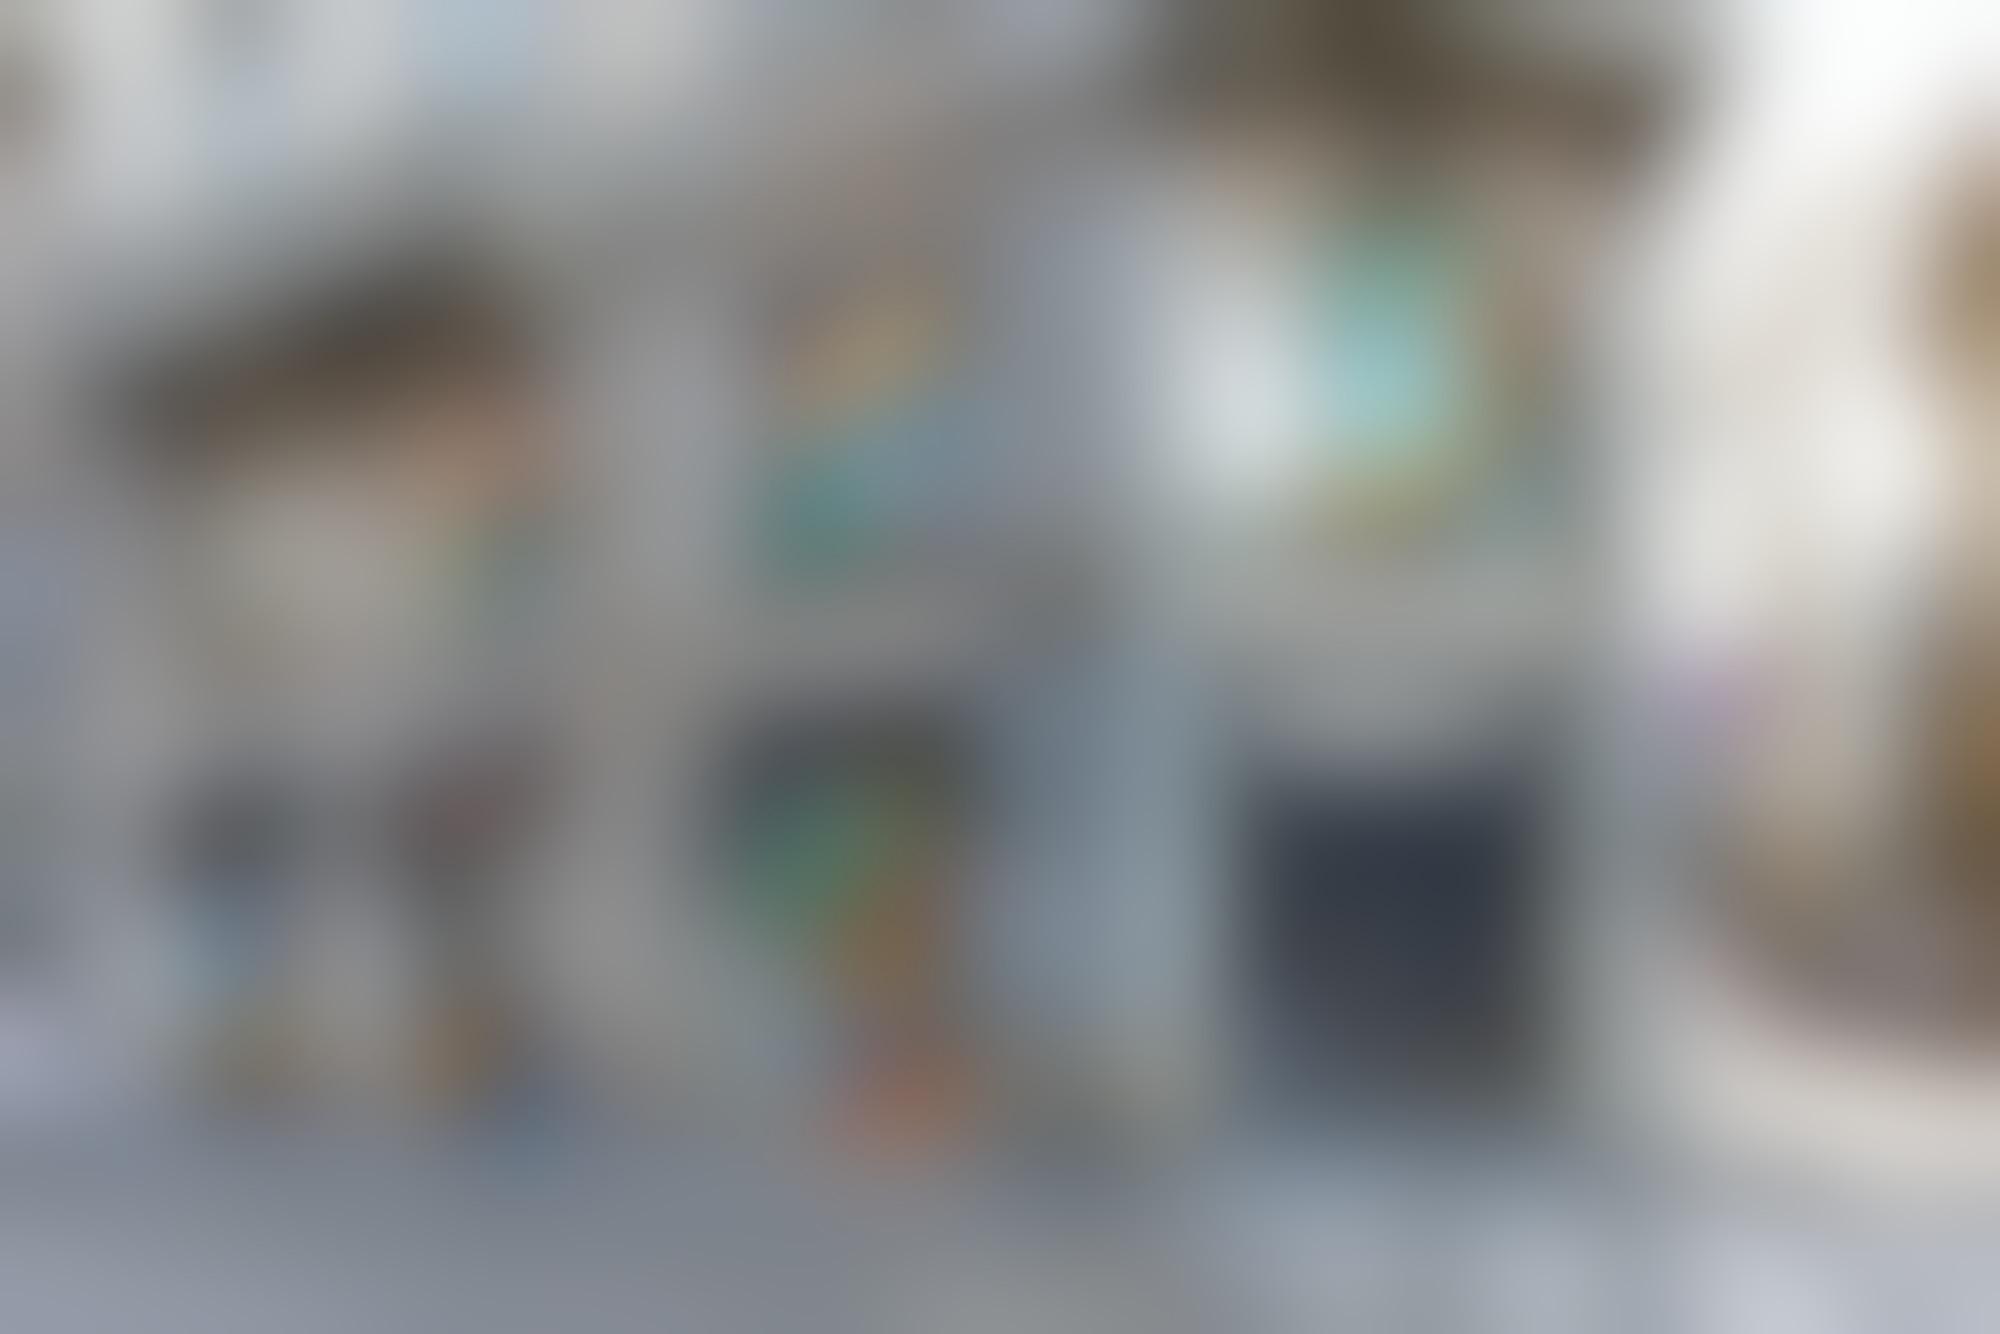 Window Lush Via Torino Naked Shop310518 4118 1280 autocompressfitresizeixlibphp 1 1 0max h2000max w3 D2000q80s0078eaf7917d1da92f26f6572118a6bc